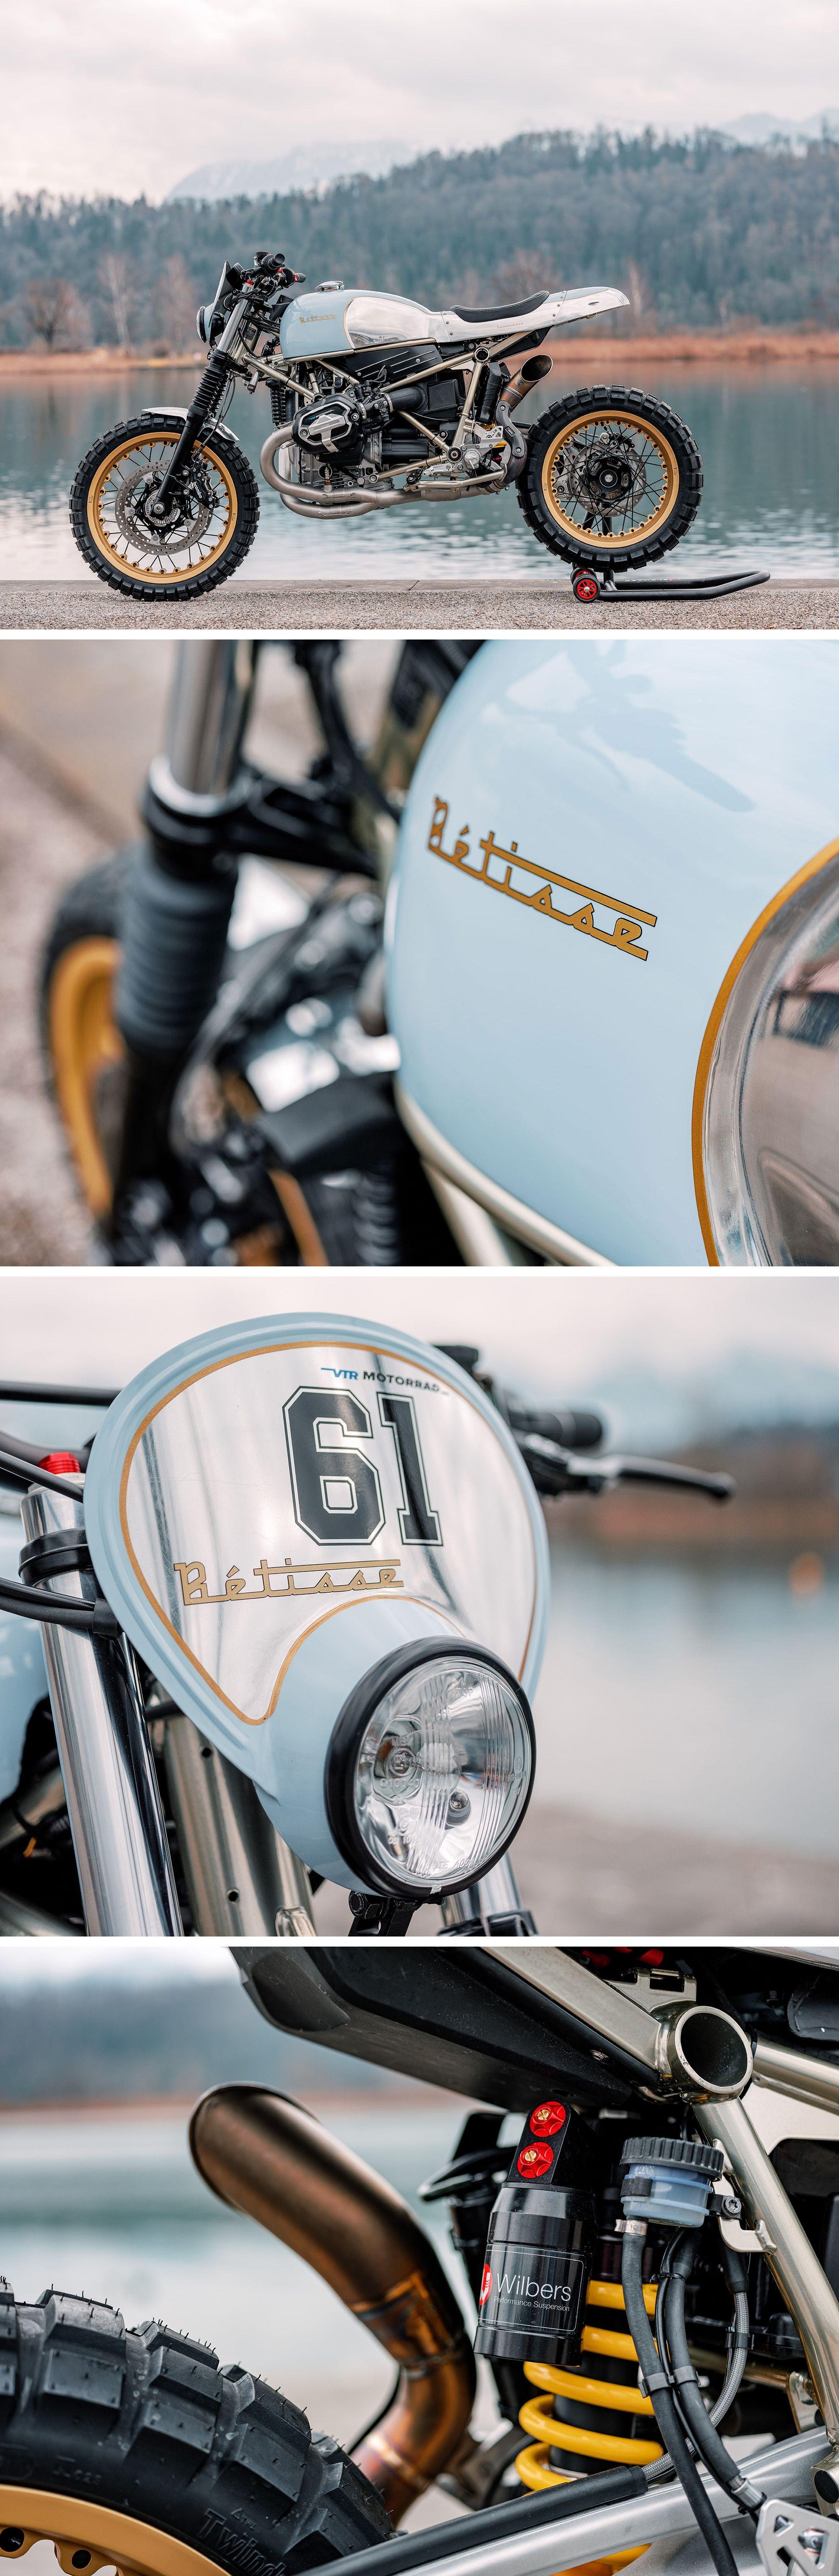 The Bmw R Nine T Scrambler Betisse Bike R Nine T Scrambler